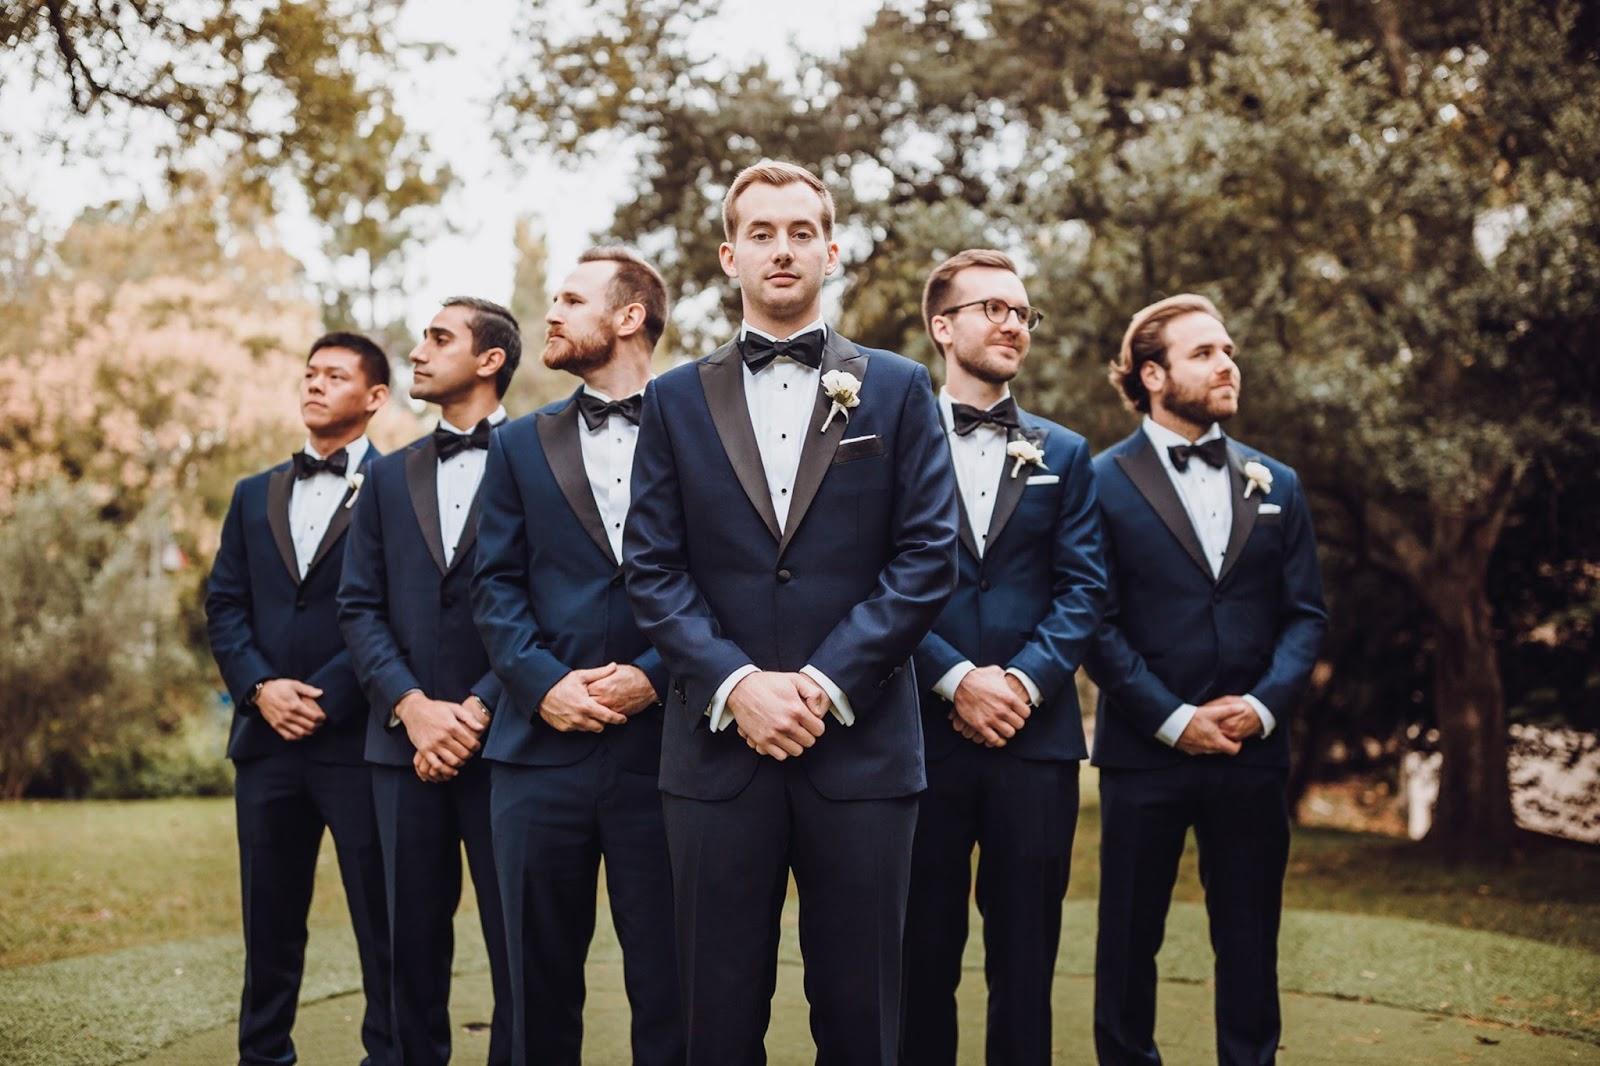 Black Tie Wedding Attire for Men Photo